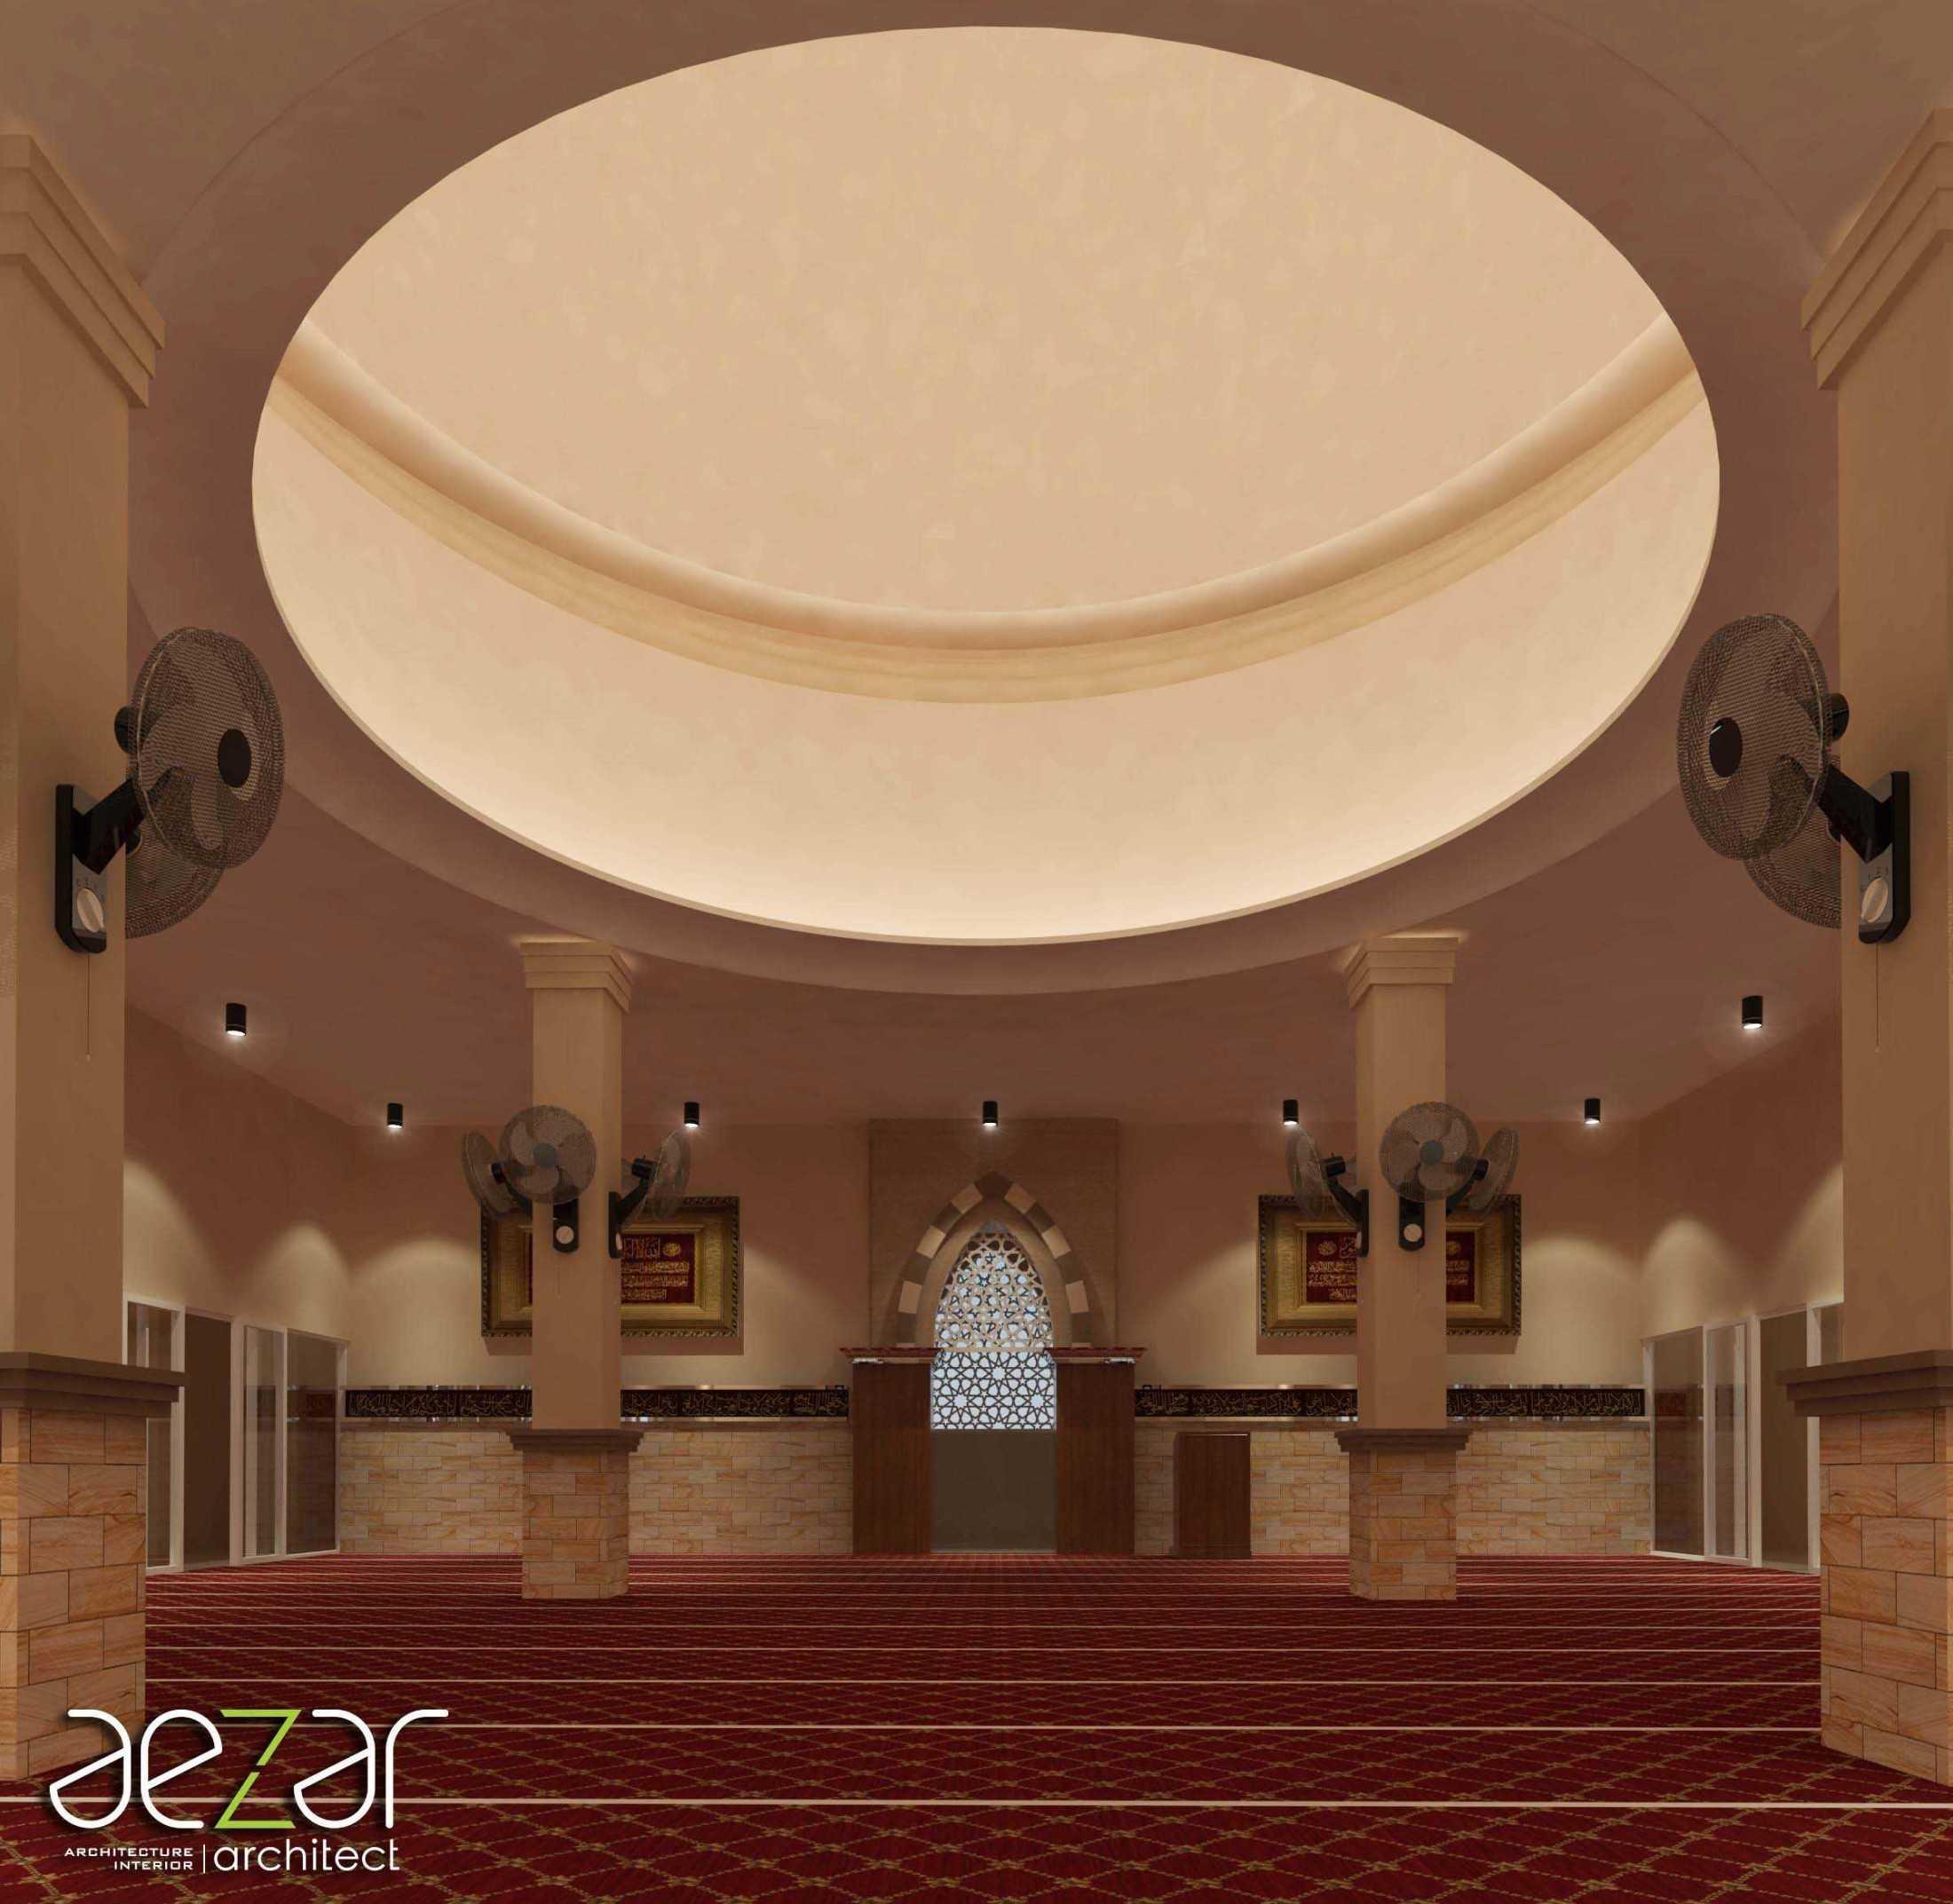 Aezar Architect Baitussalam Mosque Kabupaten Sragen, Jawa Tengah, Indonesia Kabupaten Sragen, Jawa Tengah, Indonesia Interior View  54438